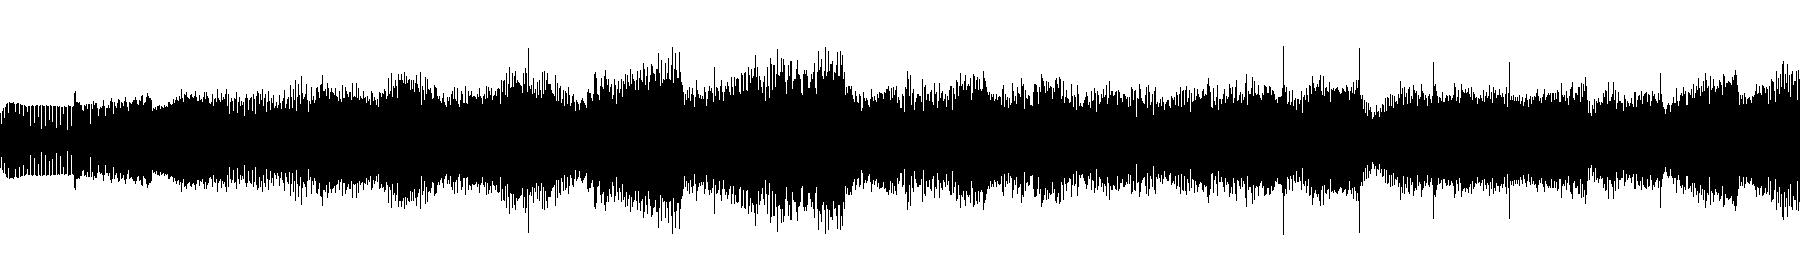 95 c 6